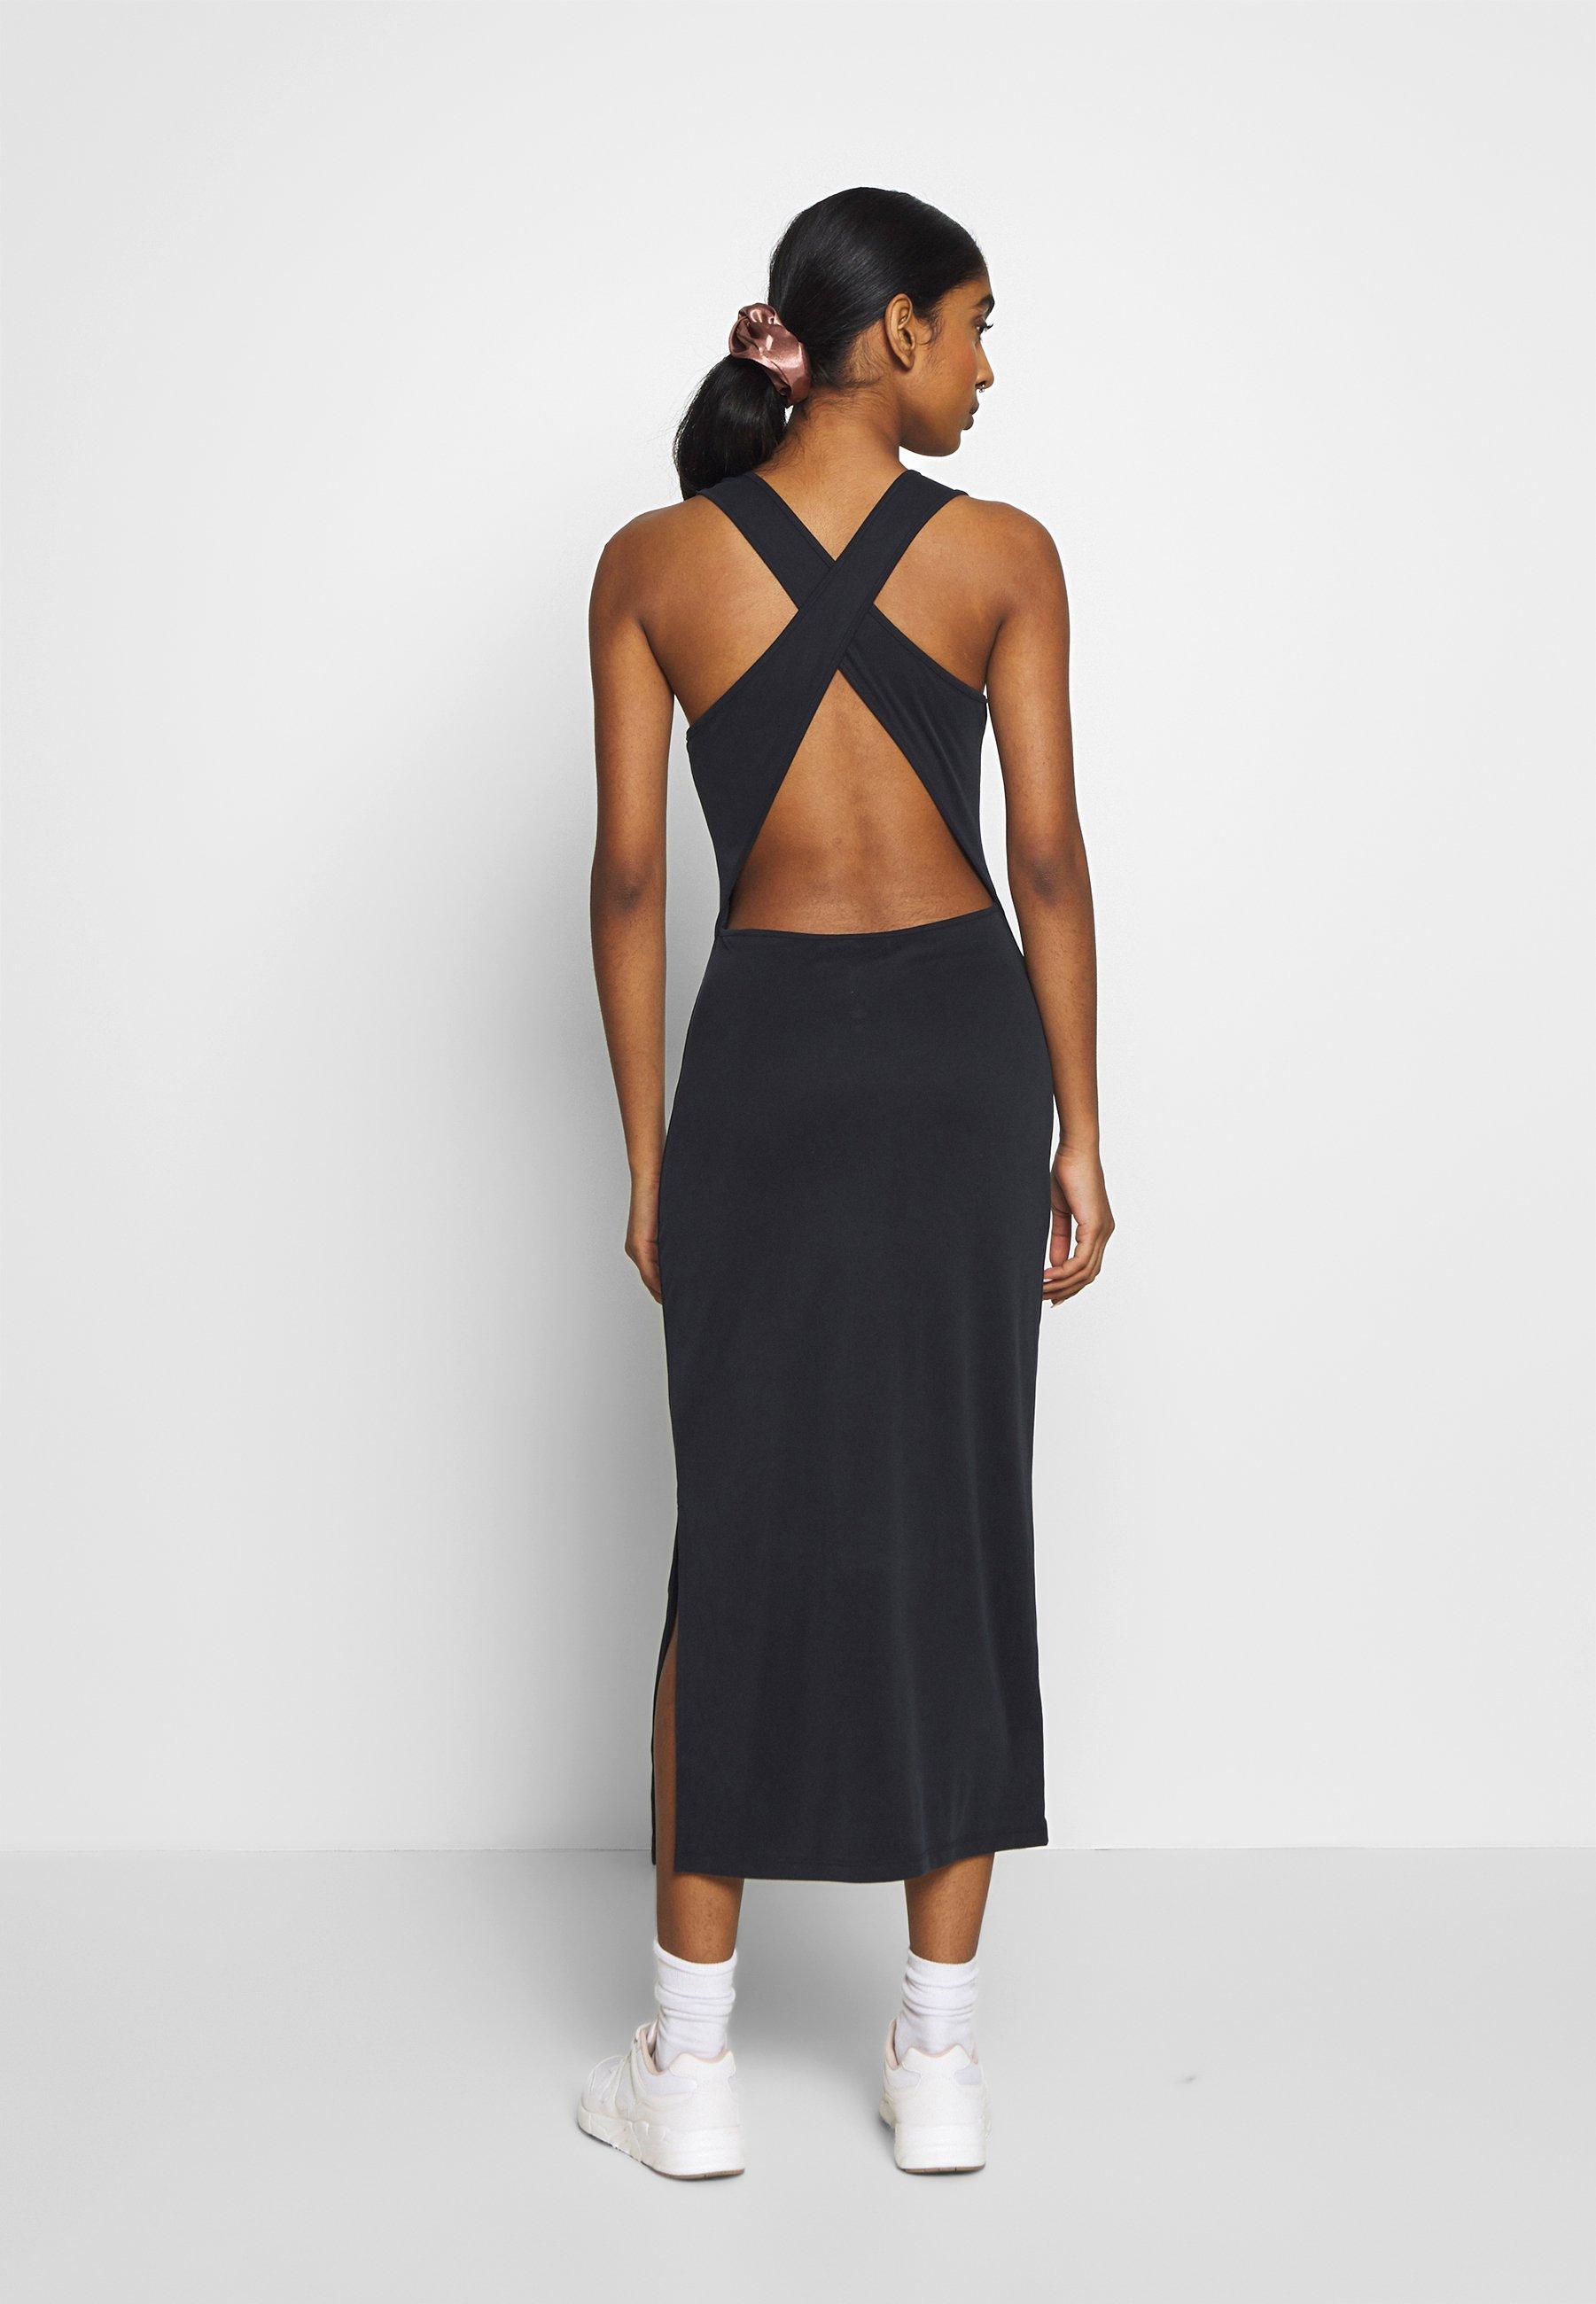 Superdry Arizona Cross Back Midi Dress - Jerseyklänning Black